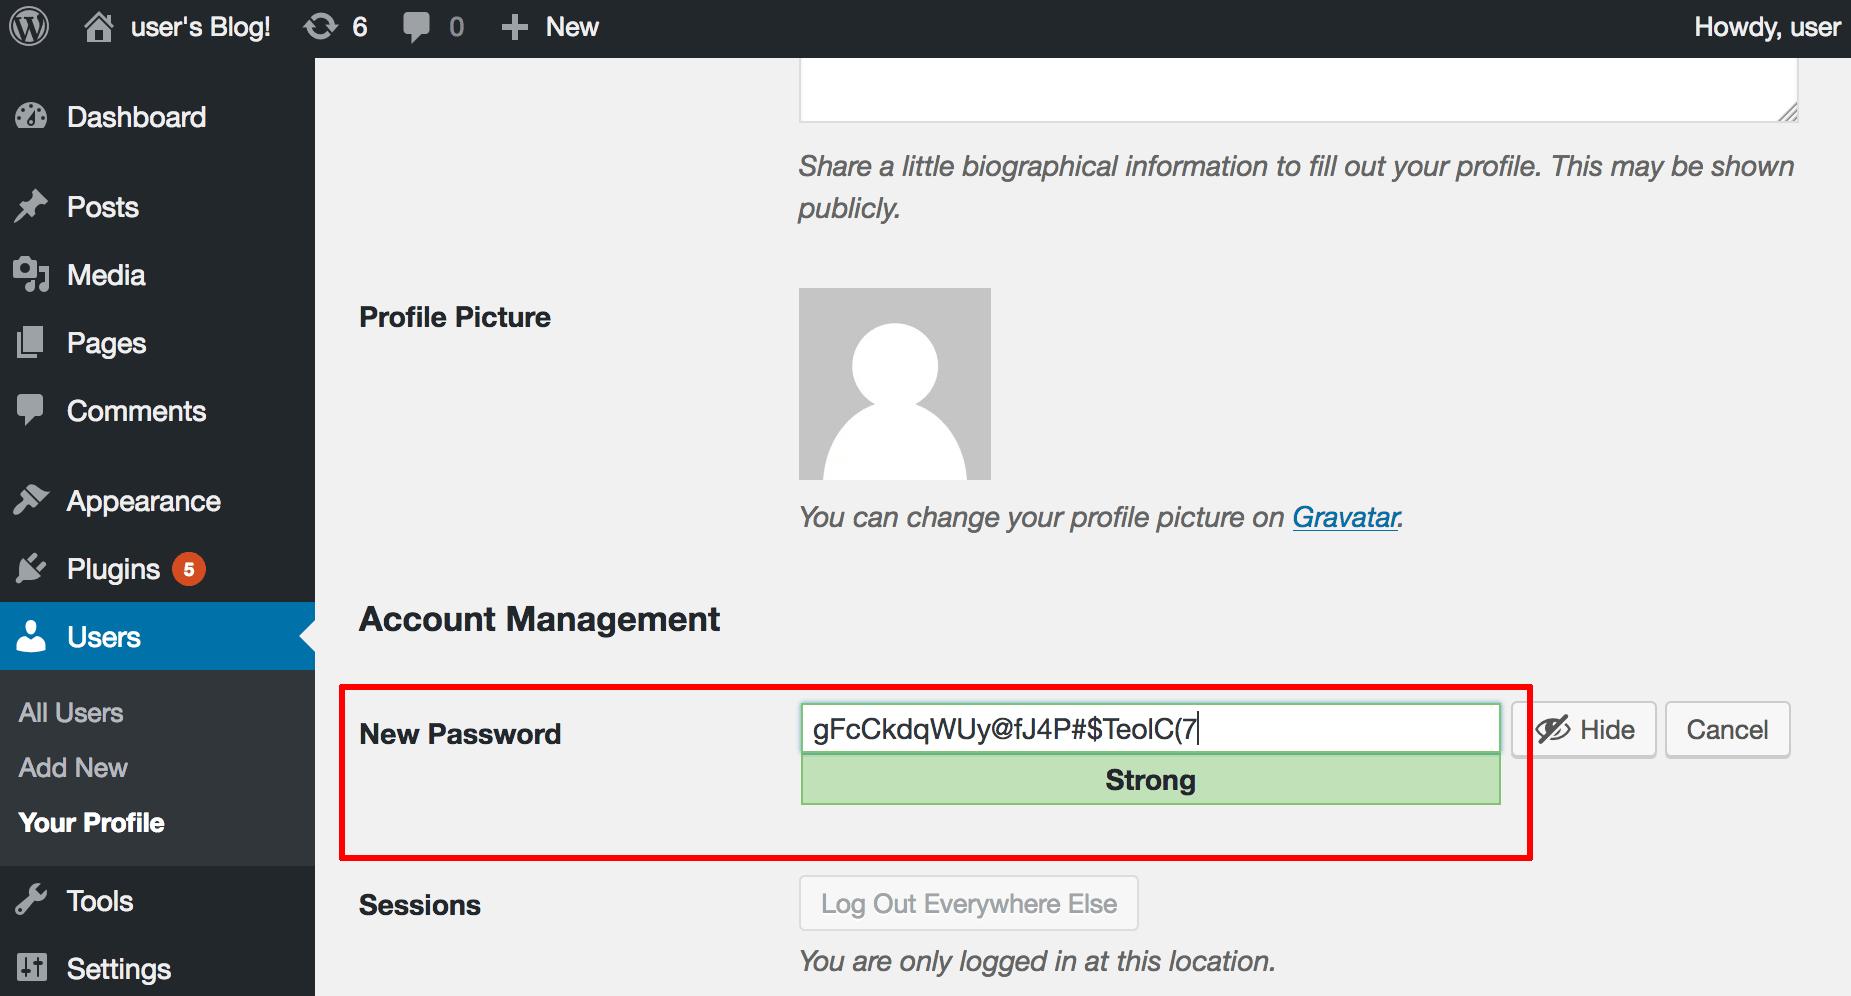 Password modification